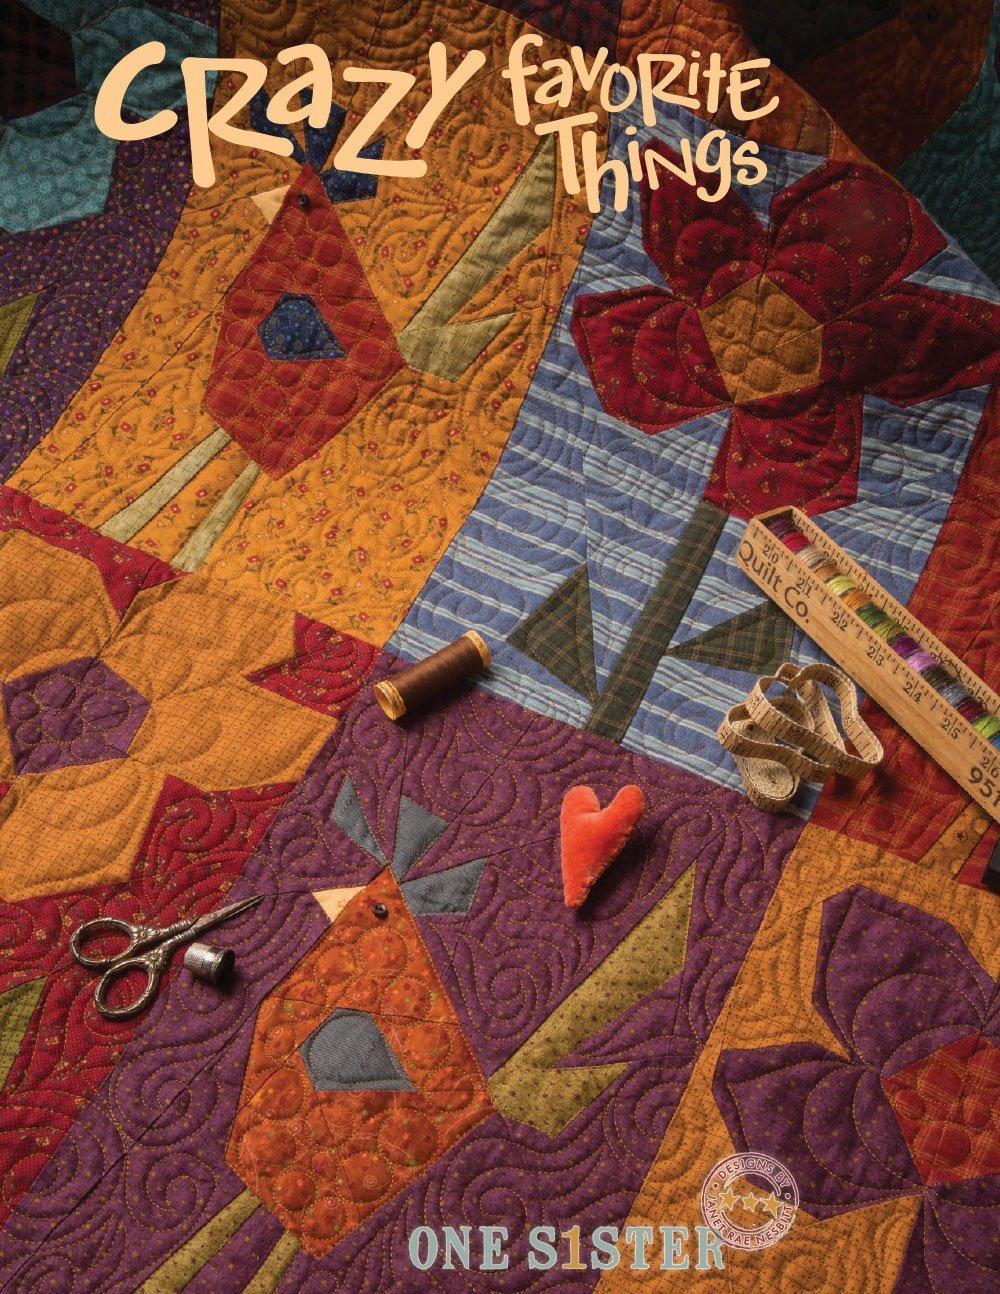 Crazy favorite things by Janet Rae Nesbitt